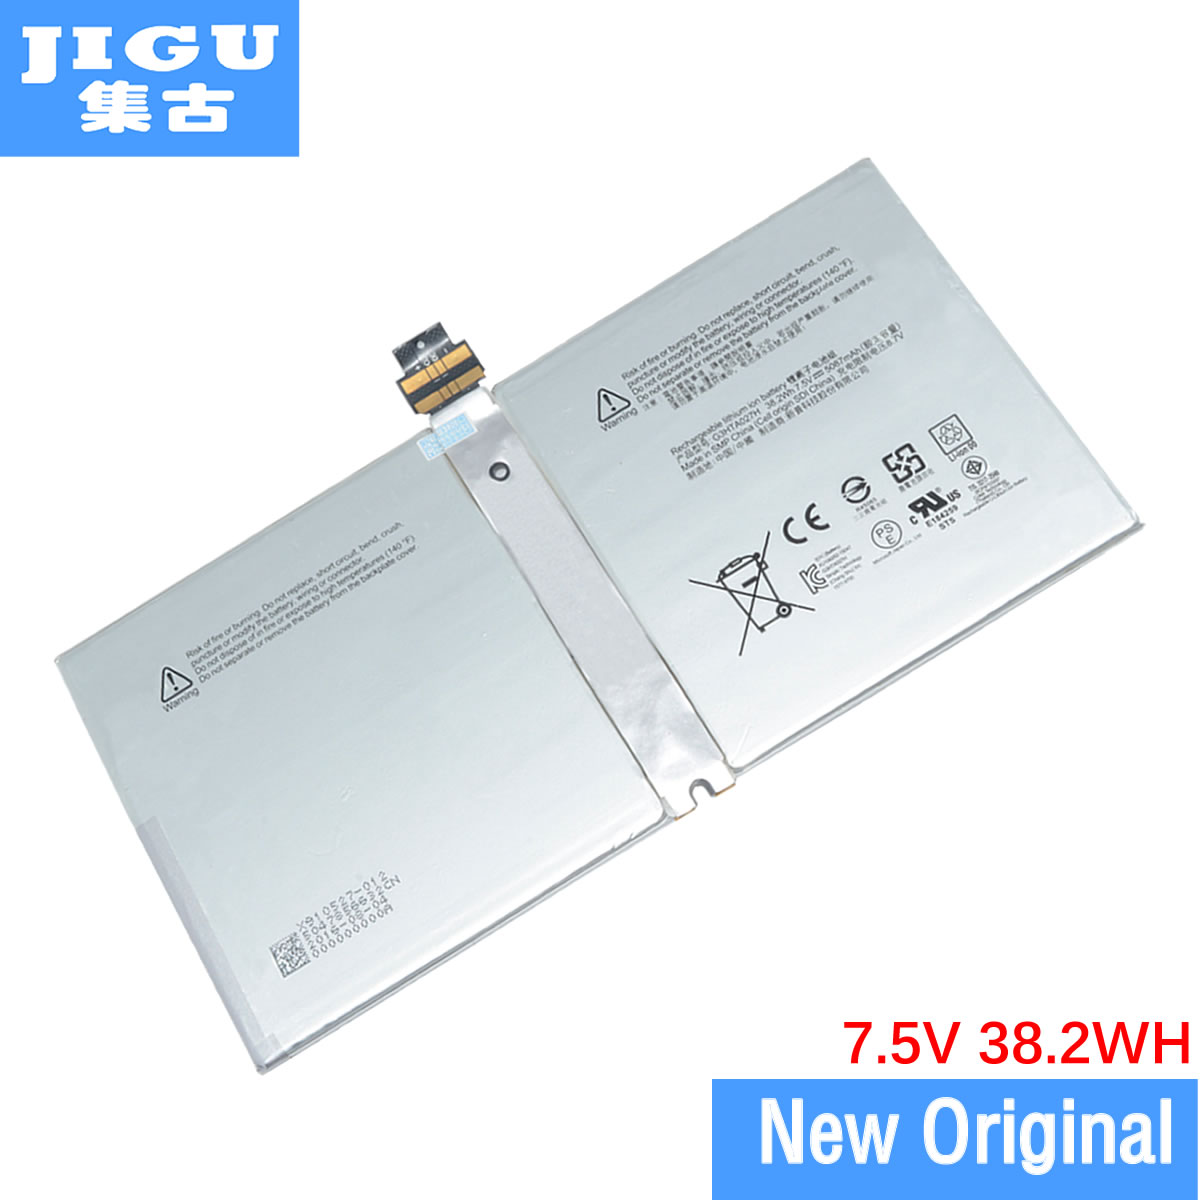 JIGU Original Laptop Battery DYNR01 G3HTA027H P21GU9 For MICROSOFT Surface Pro 4 1724 7.5V 38.2WH G3HTA027H BATTERY